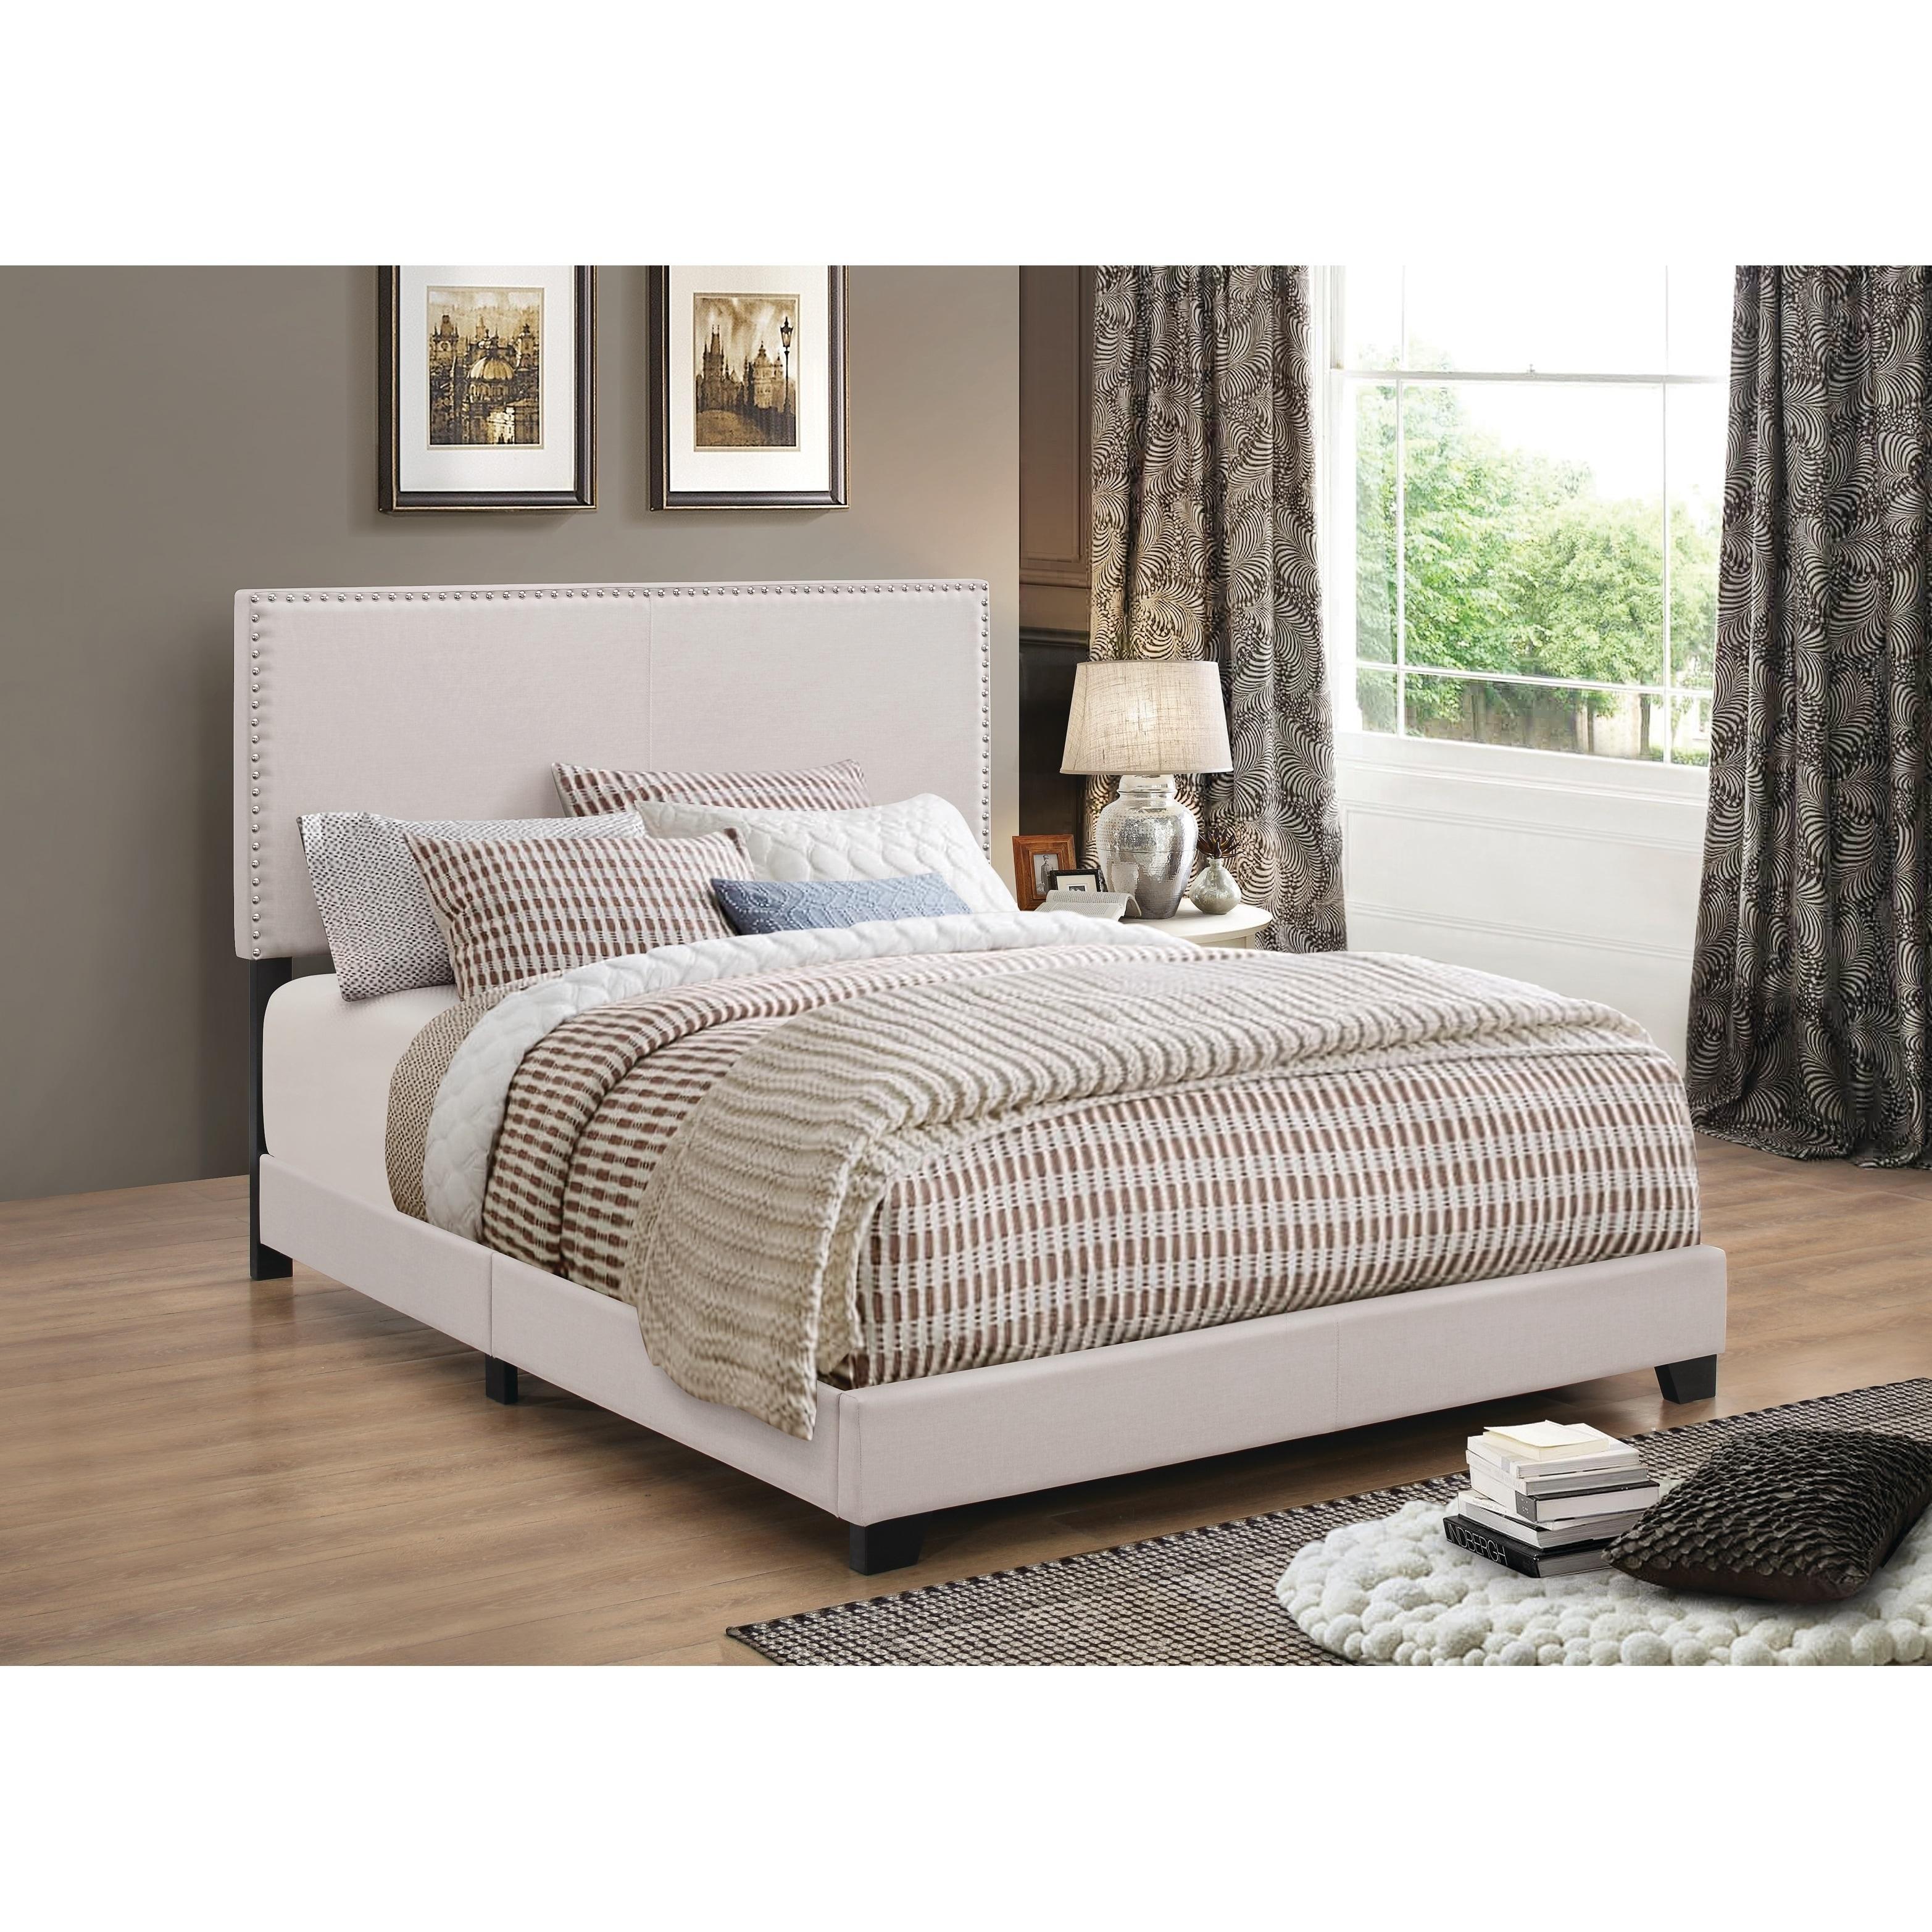 Boyd Upholstered Bed